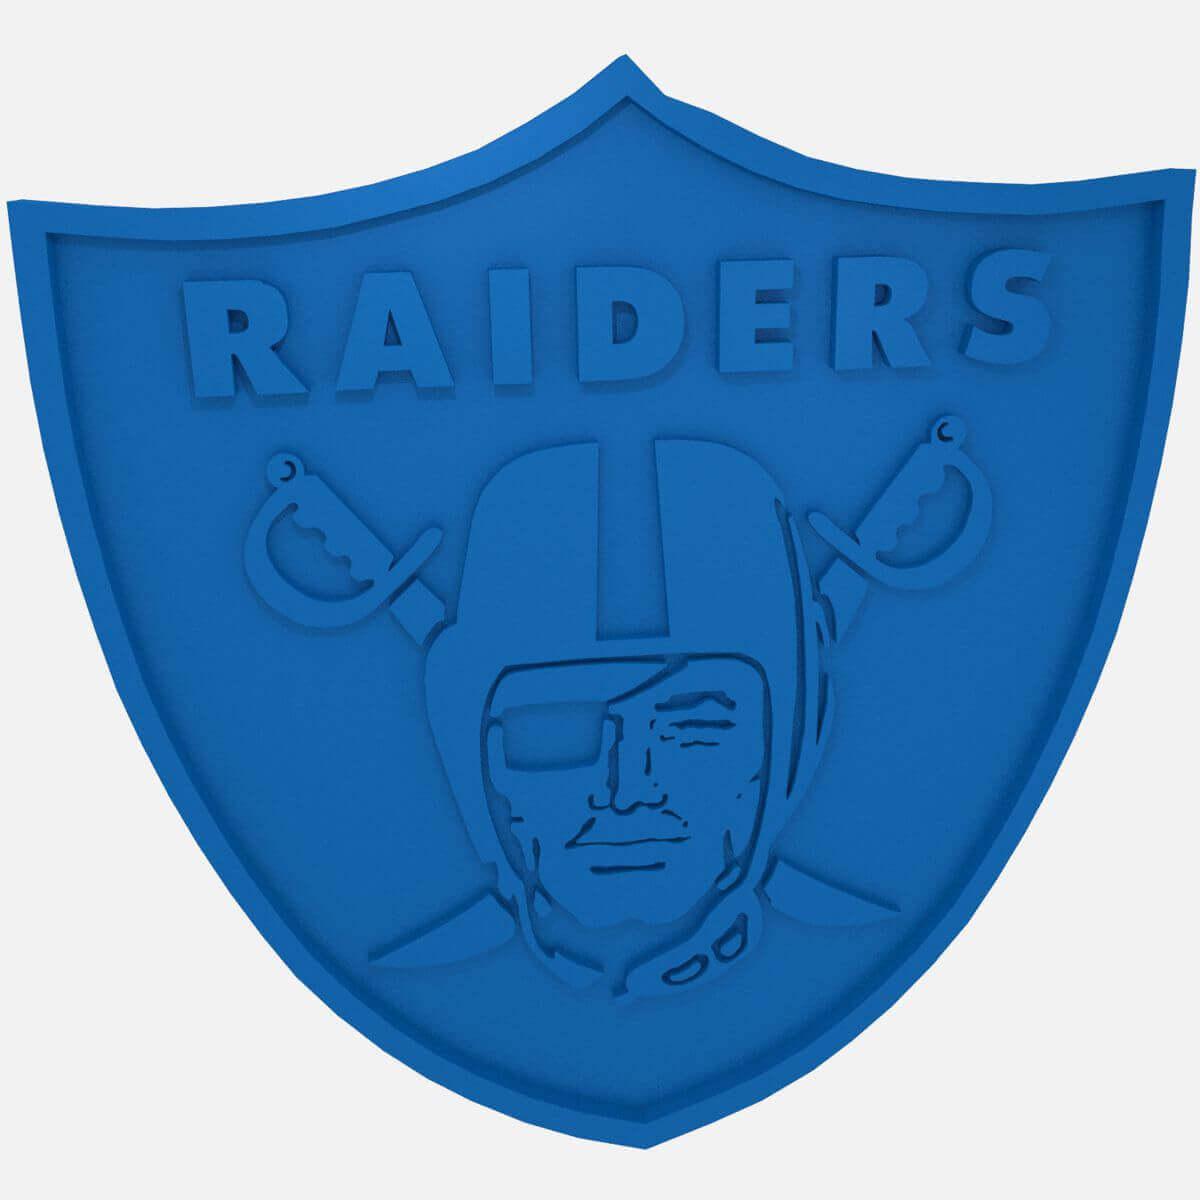 Raiders nfl football logo print ready 3d model raiders nfl football logo buycottarizona